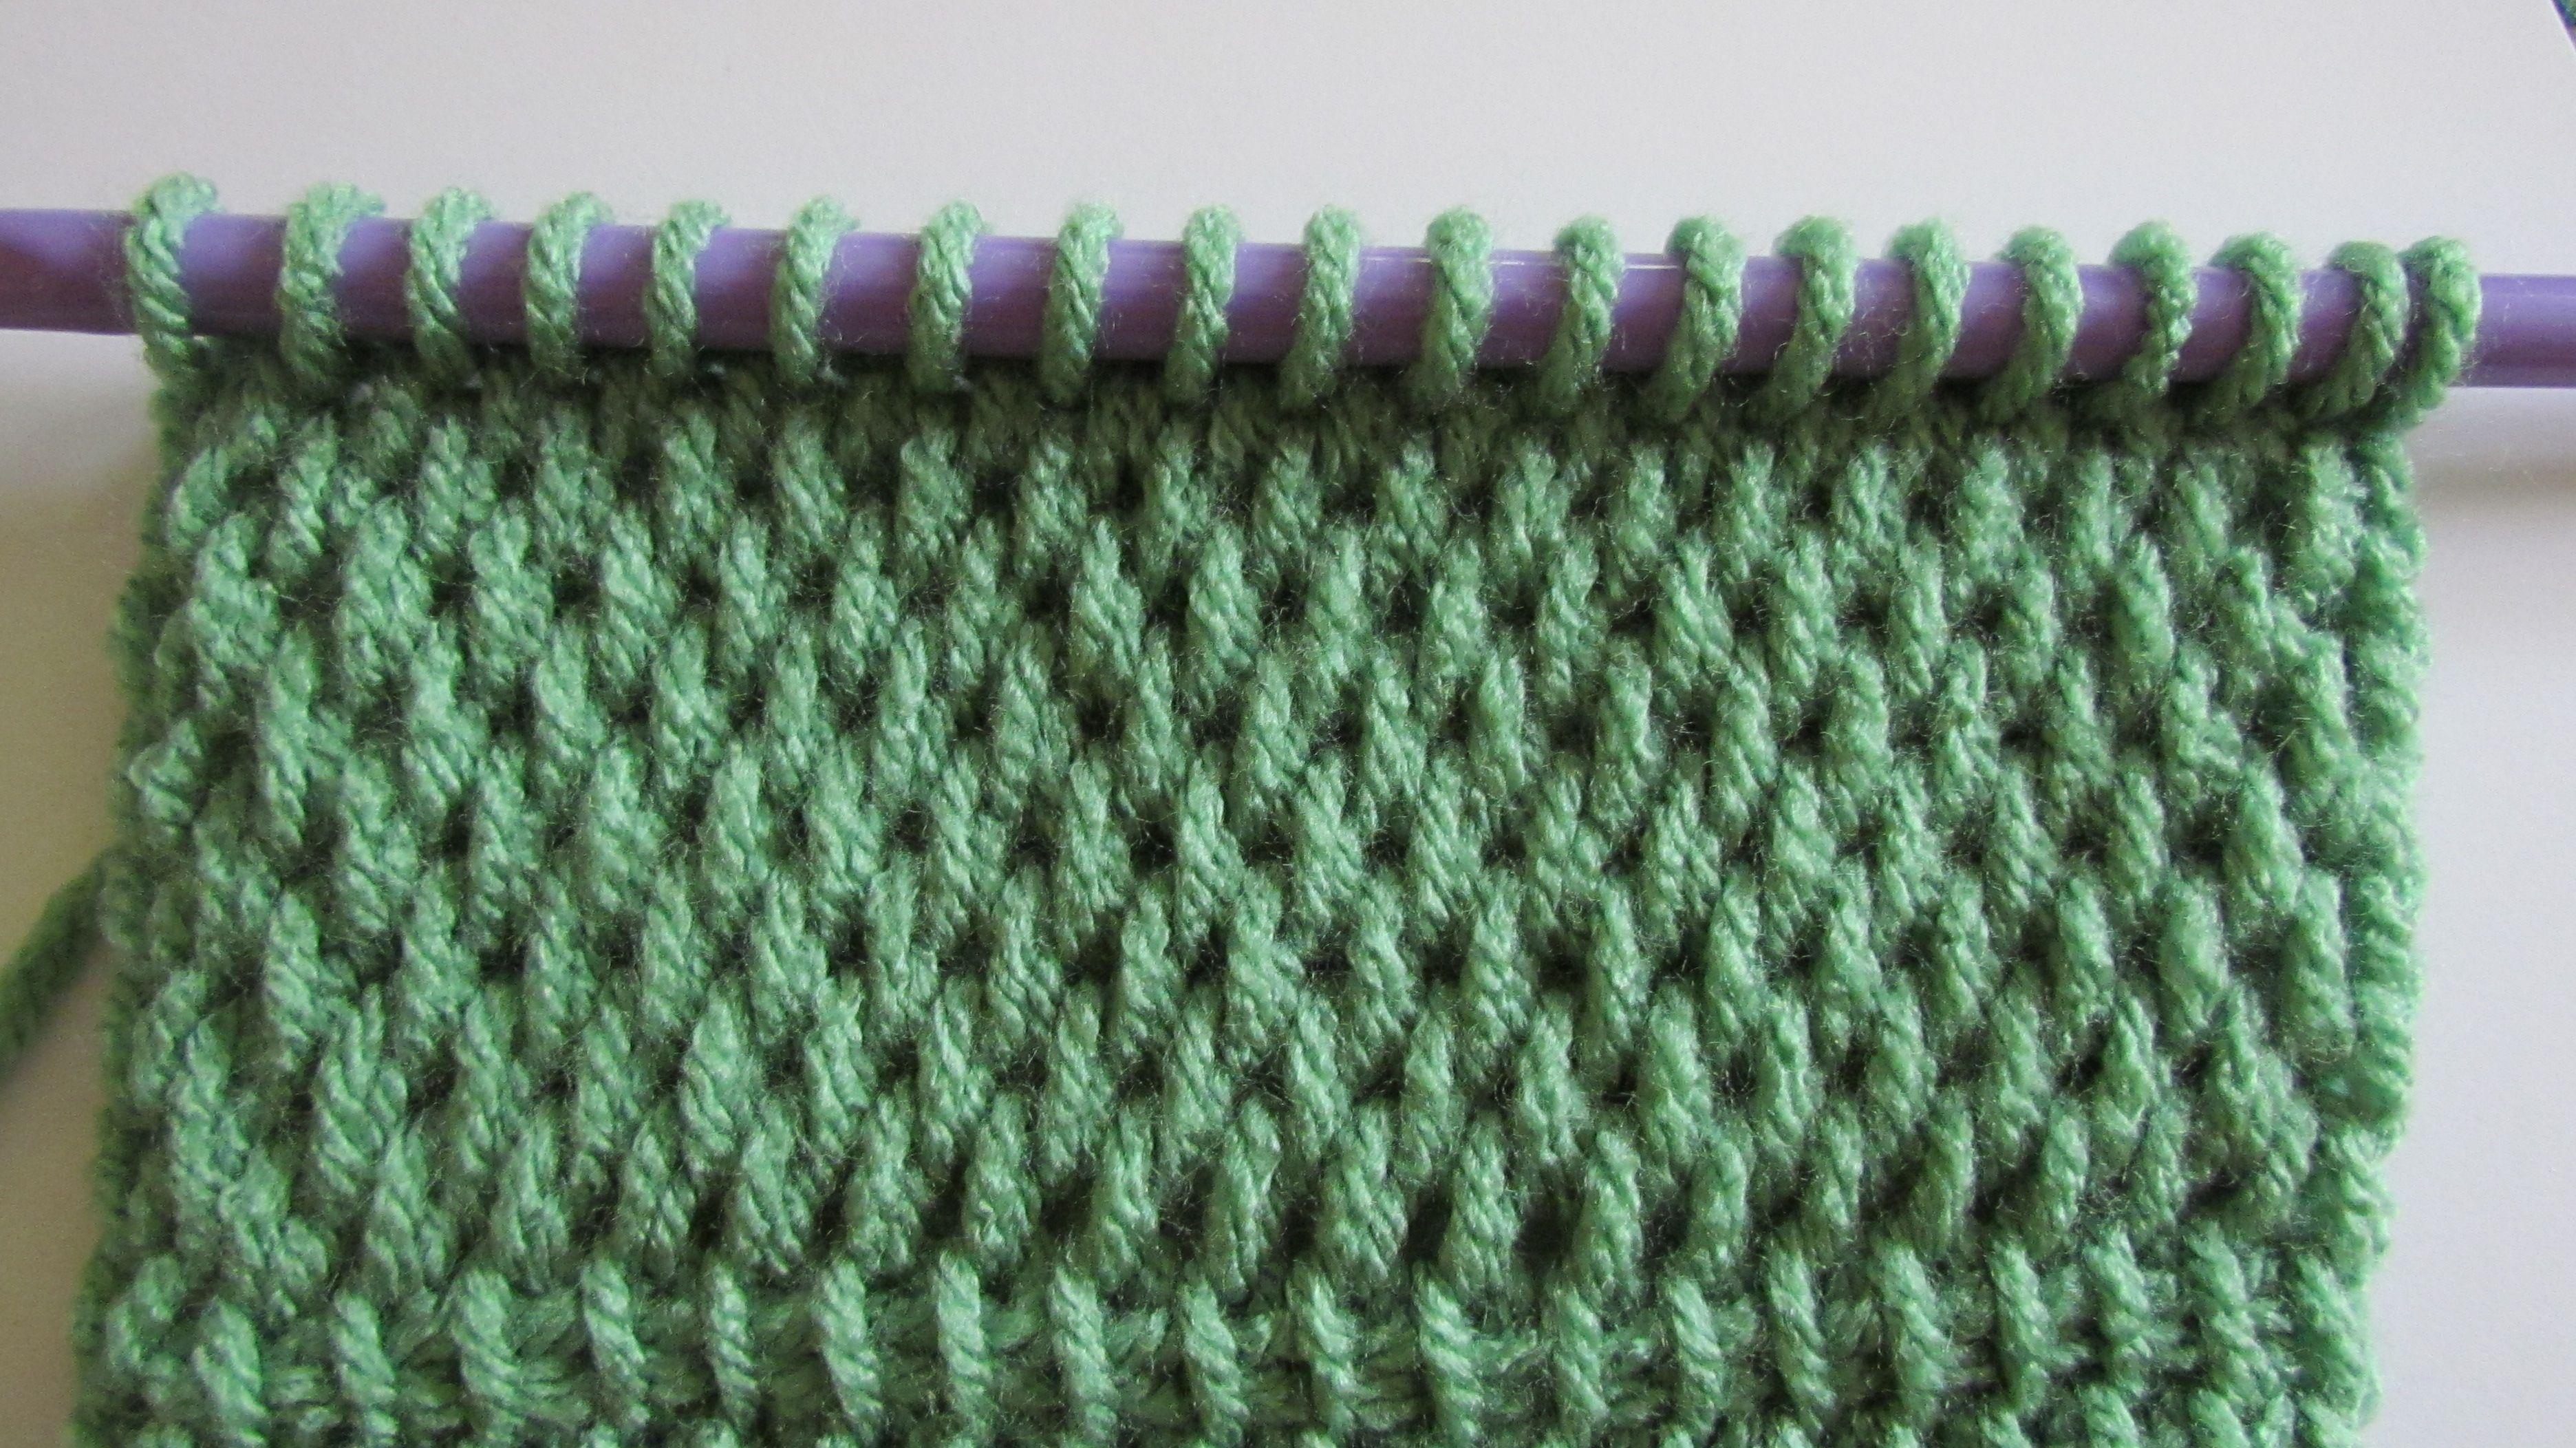 Great tunisian stitches with tunisian sampler scarf crochet tunisian sampler stitch scarf 12 different tunisian crochet stitches bankloansurffo Gallery